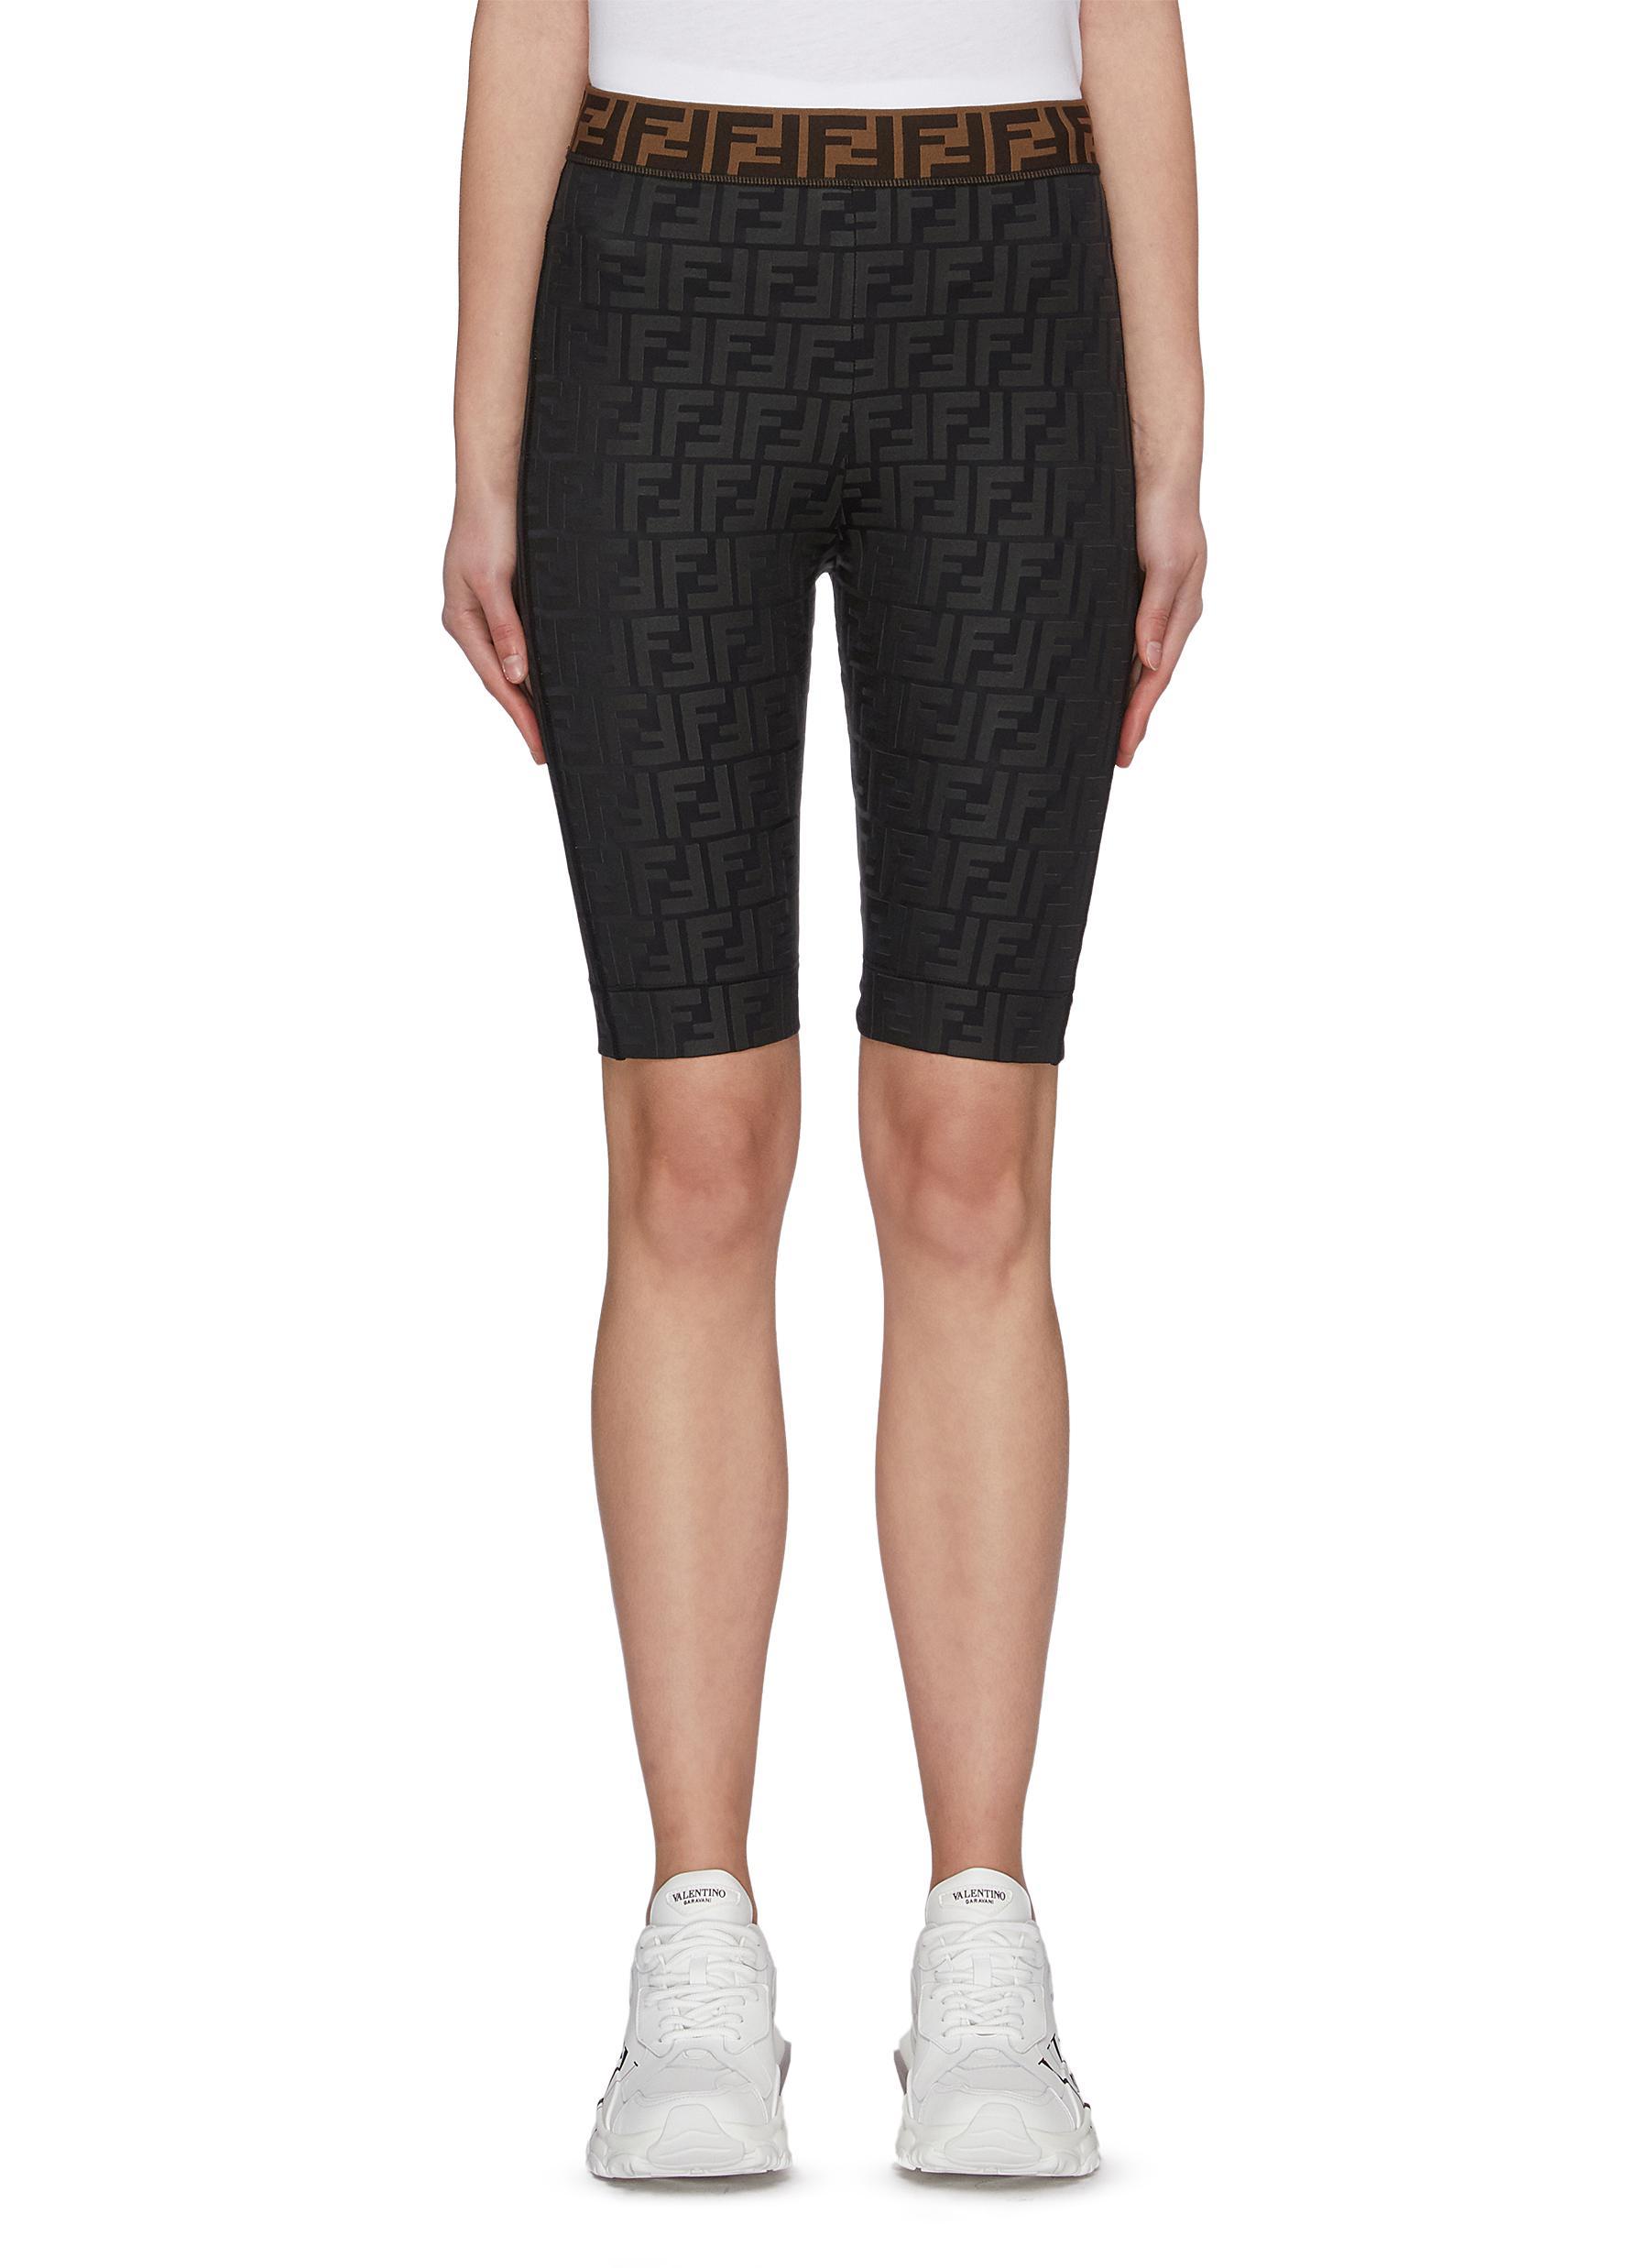 Buy Fendi Sport Pants & Shorts 'Fendirama' logo print biker shorts